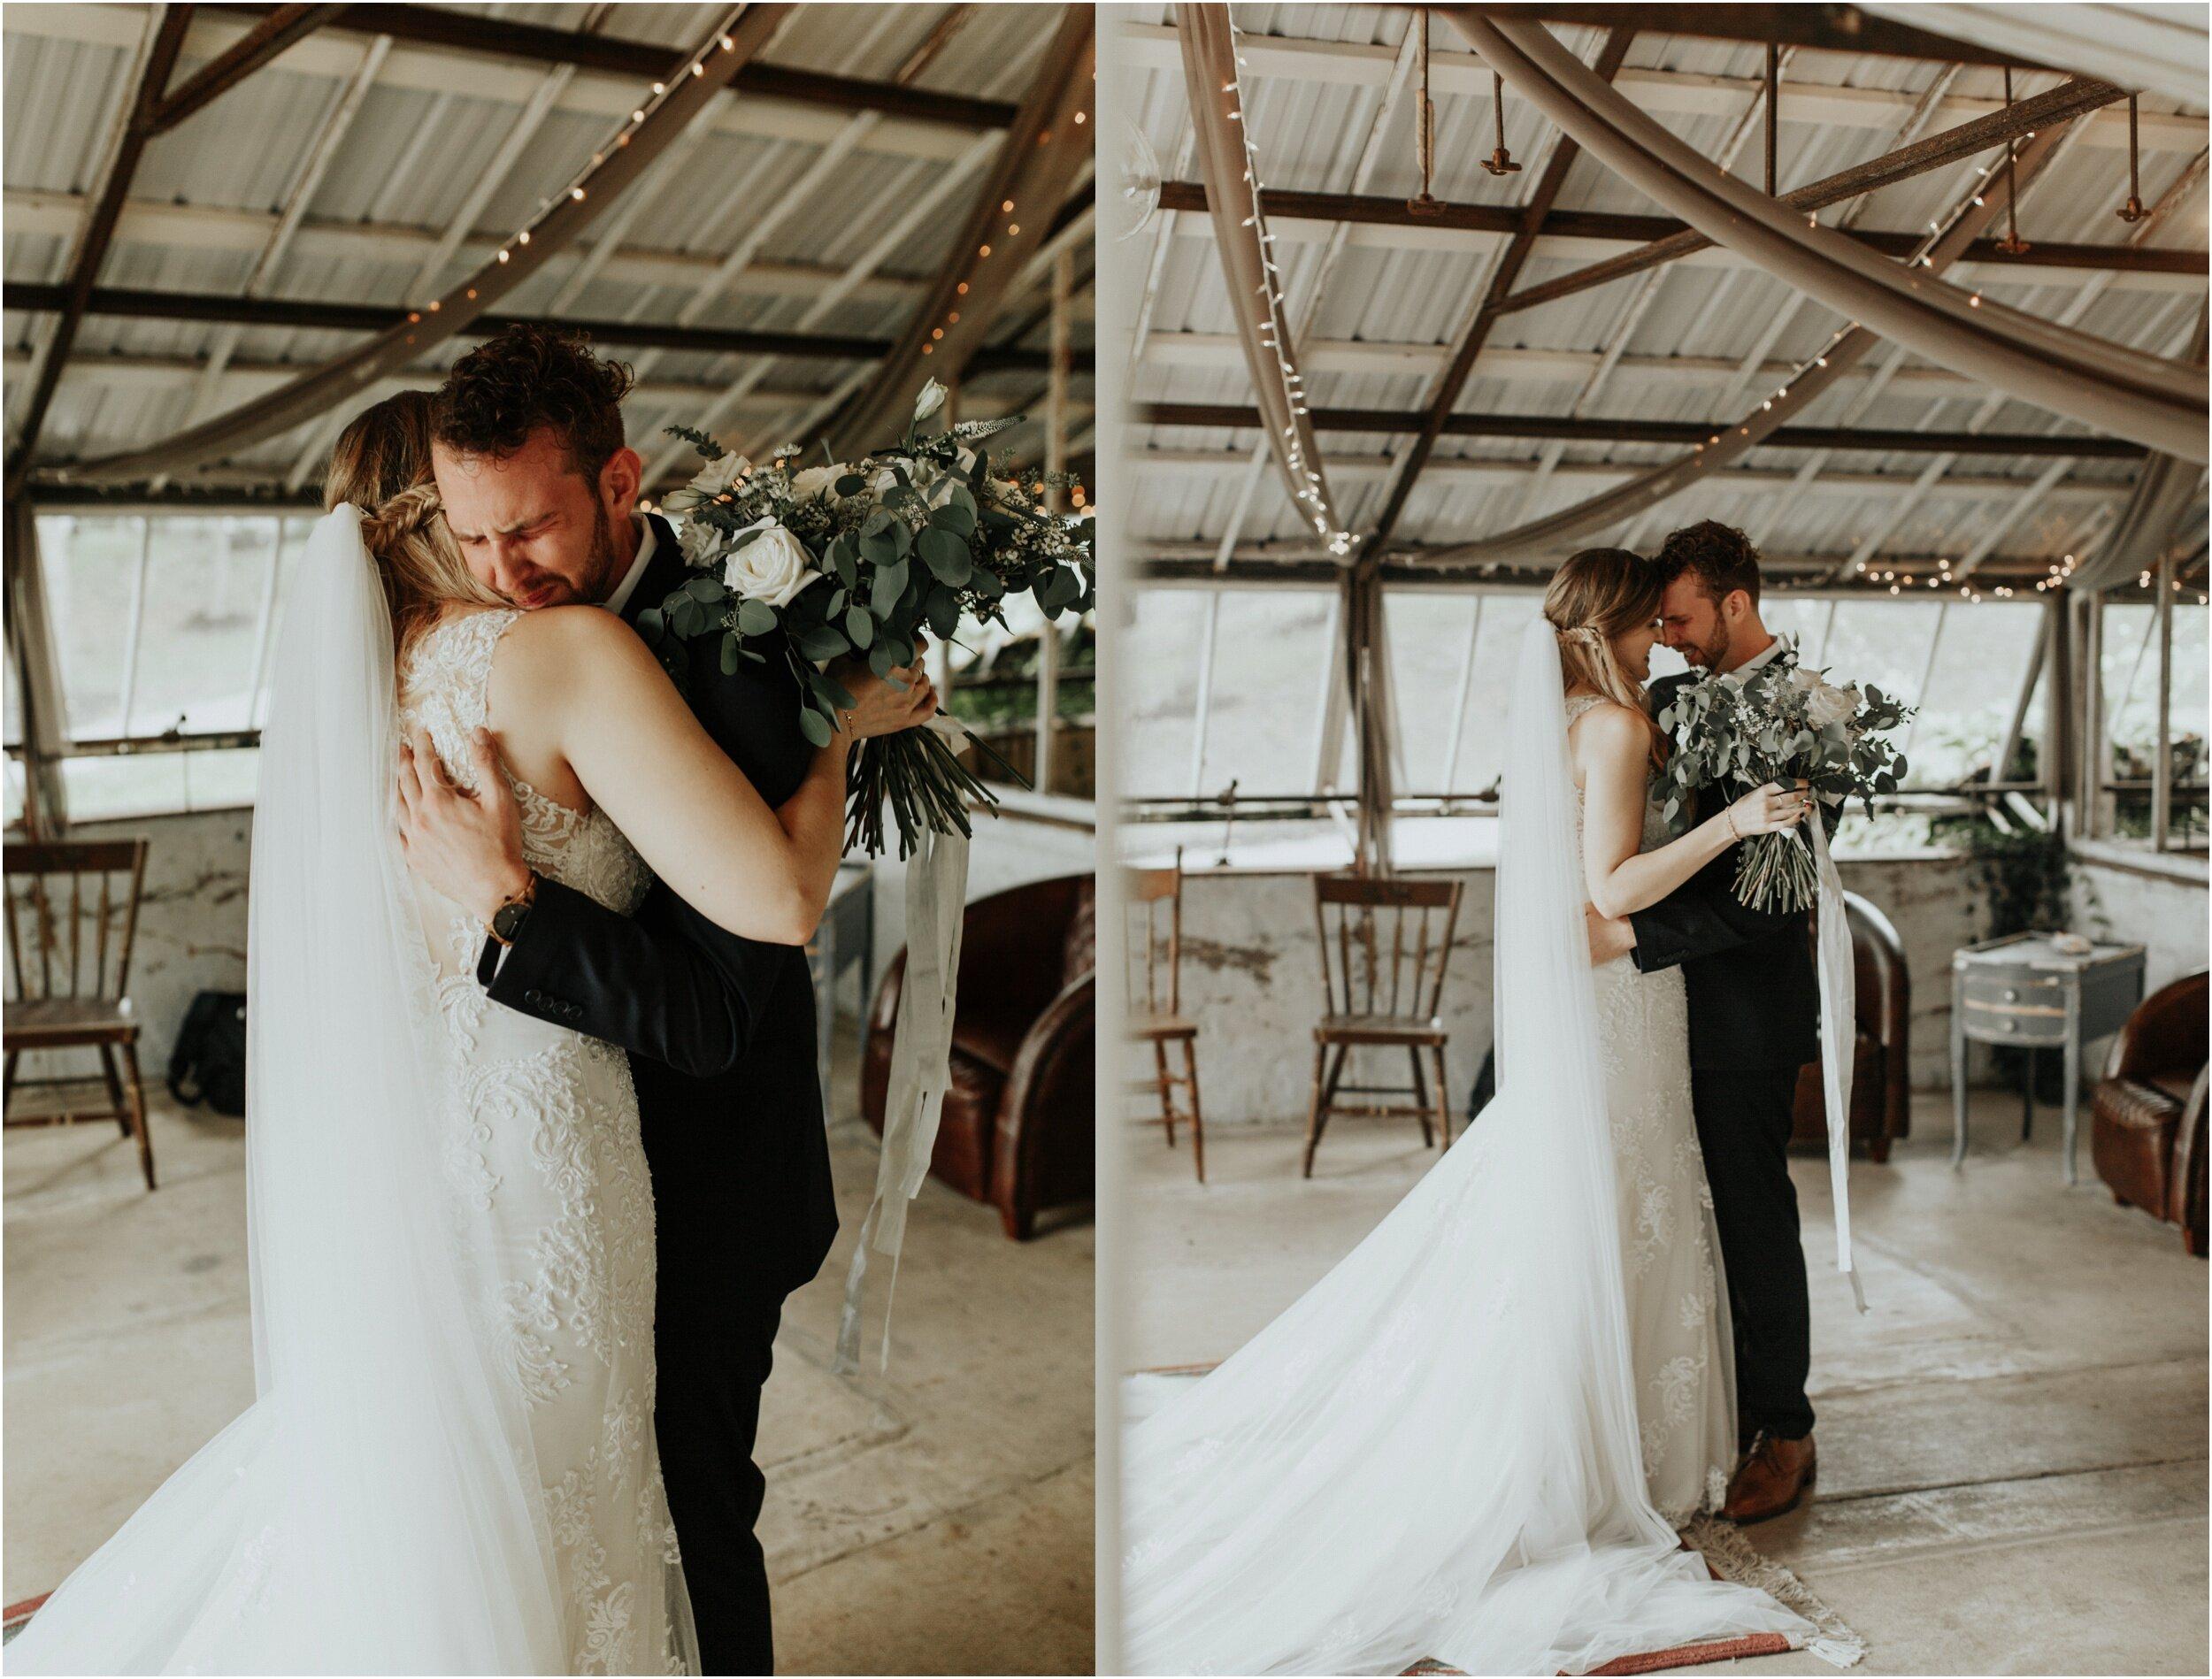 steph-and-jordan-cox-our-wedding-historic-shady-lane-compass-wedding-collective-hazel-lining-photography-destination-elopement-wedding-engagement-photography_0034.jpg